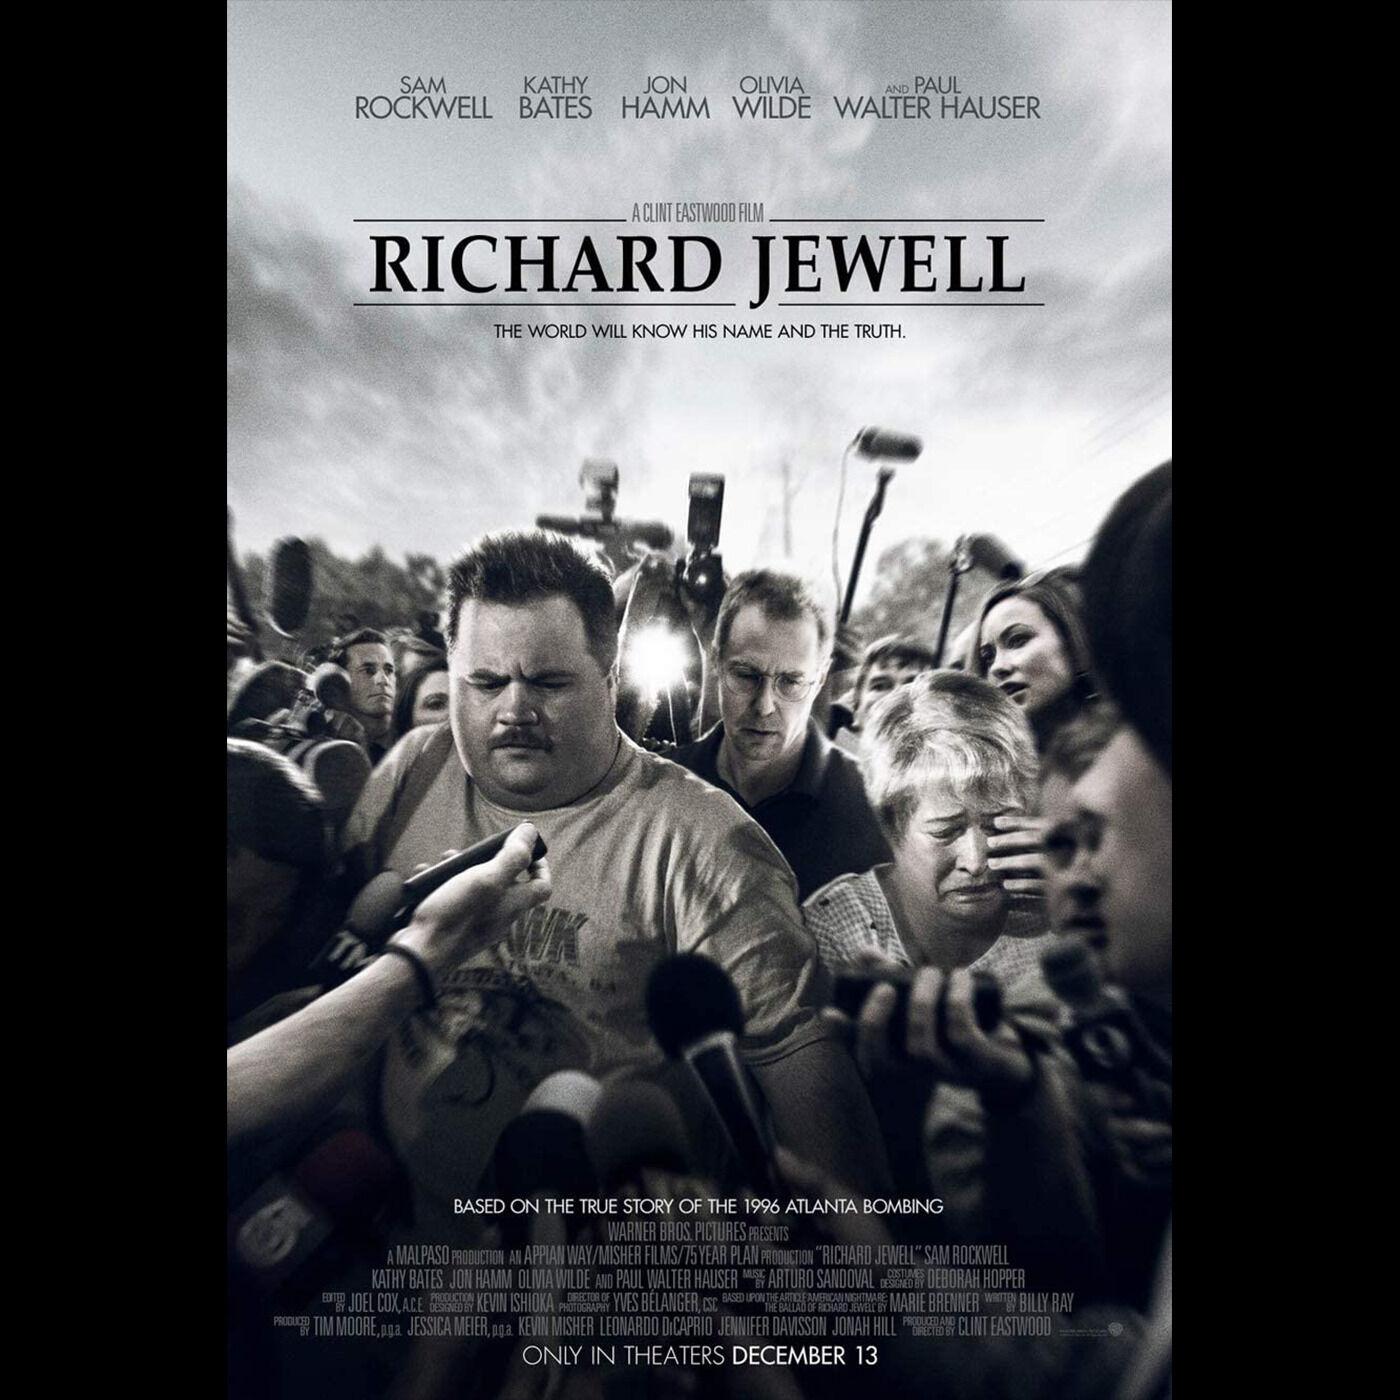 Episode 23: Richard Jewell